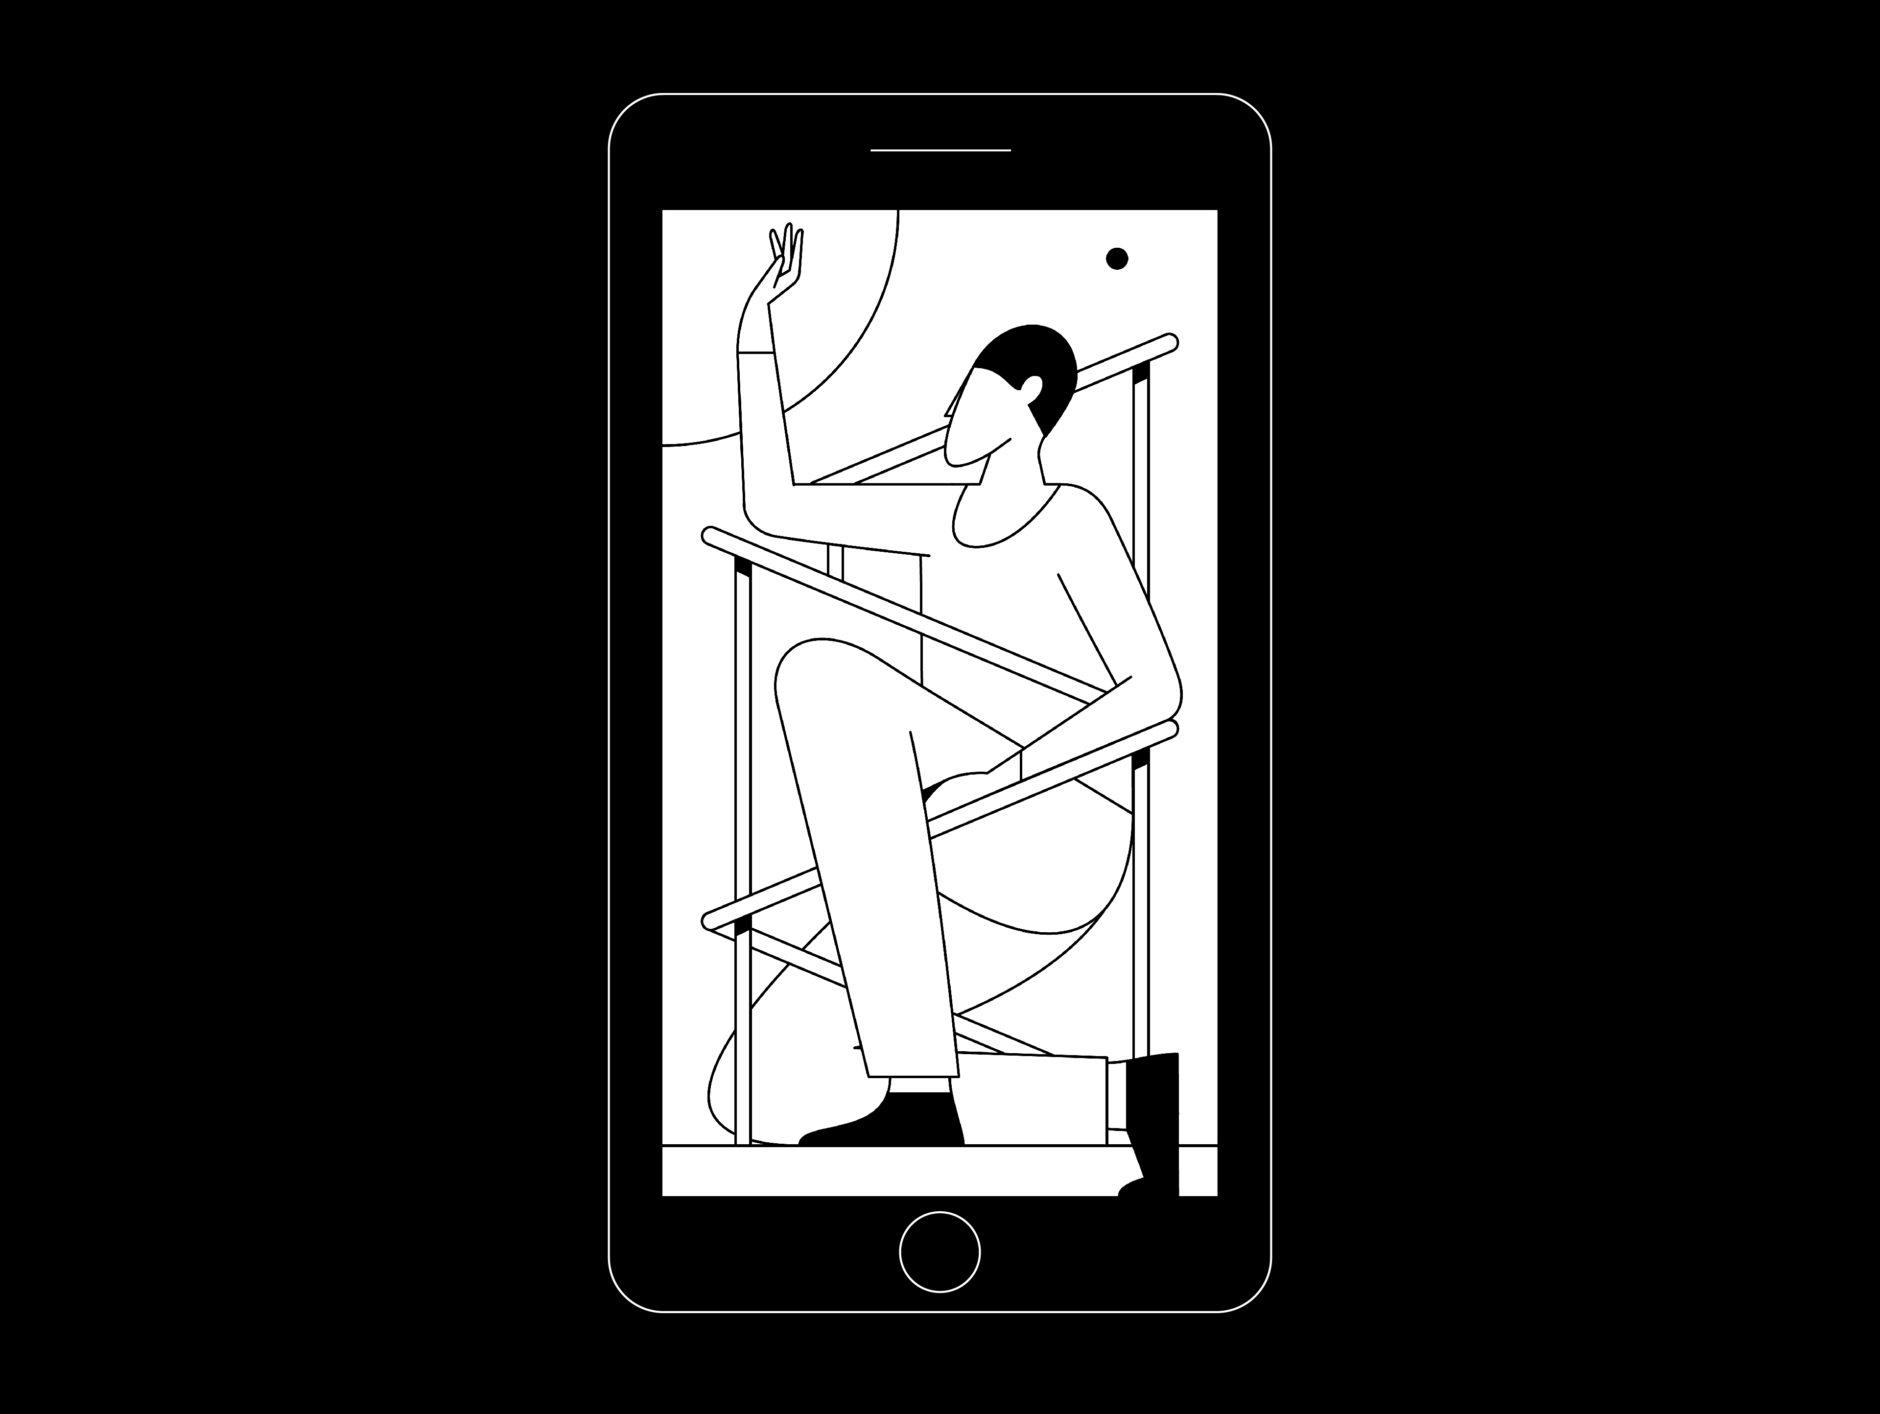 Kontrast Mobile Game von Illustrator Timo Kuilder